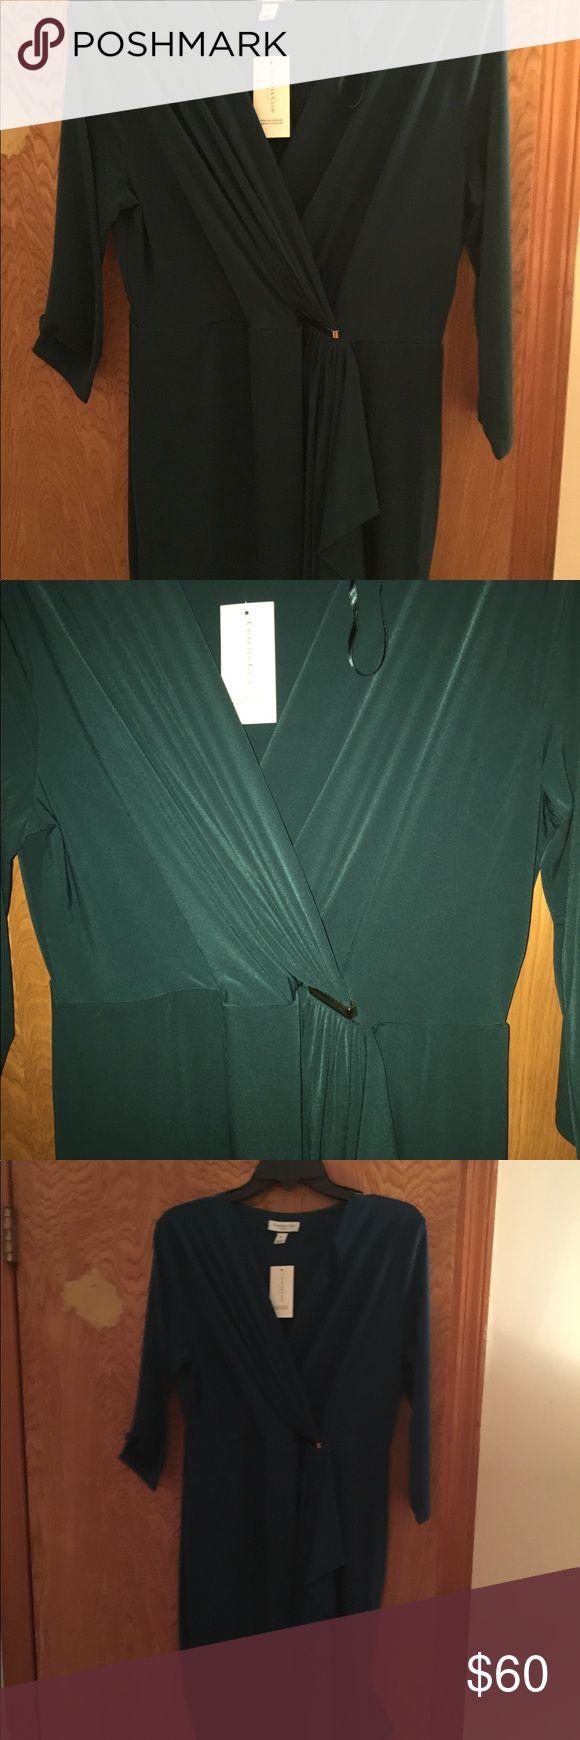 New Charter club dark green large petite dress Brand new Charter club dark green faux wrap large petite dress with tags Charter Club Dresses